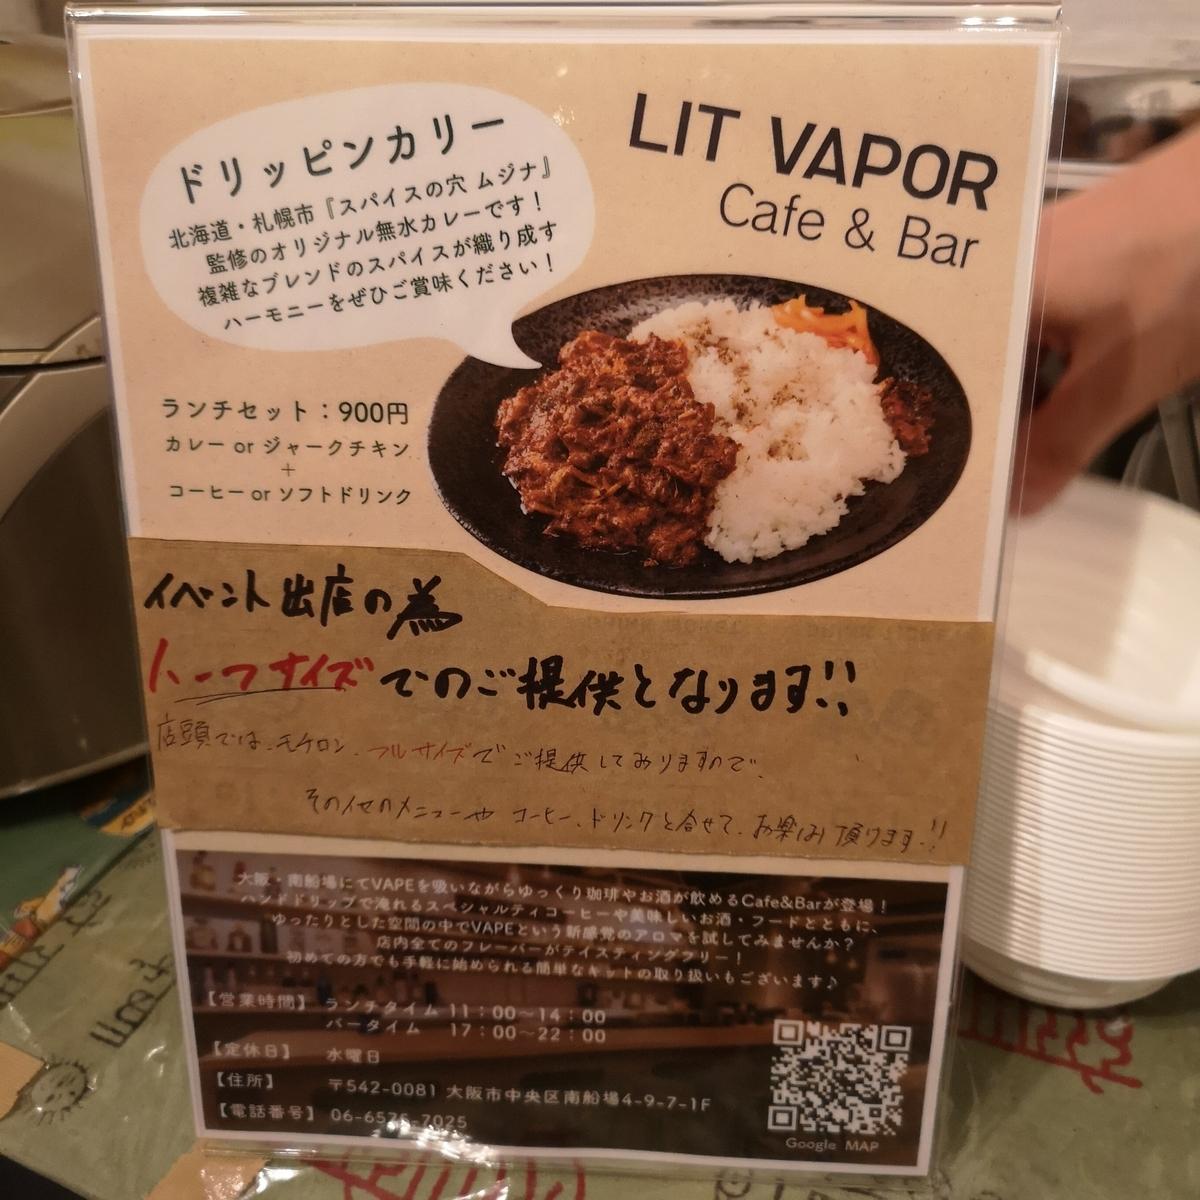 LIT VAPOR Cafe & Bar  ドリッピンカレー